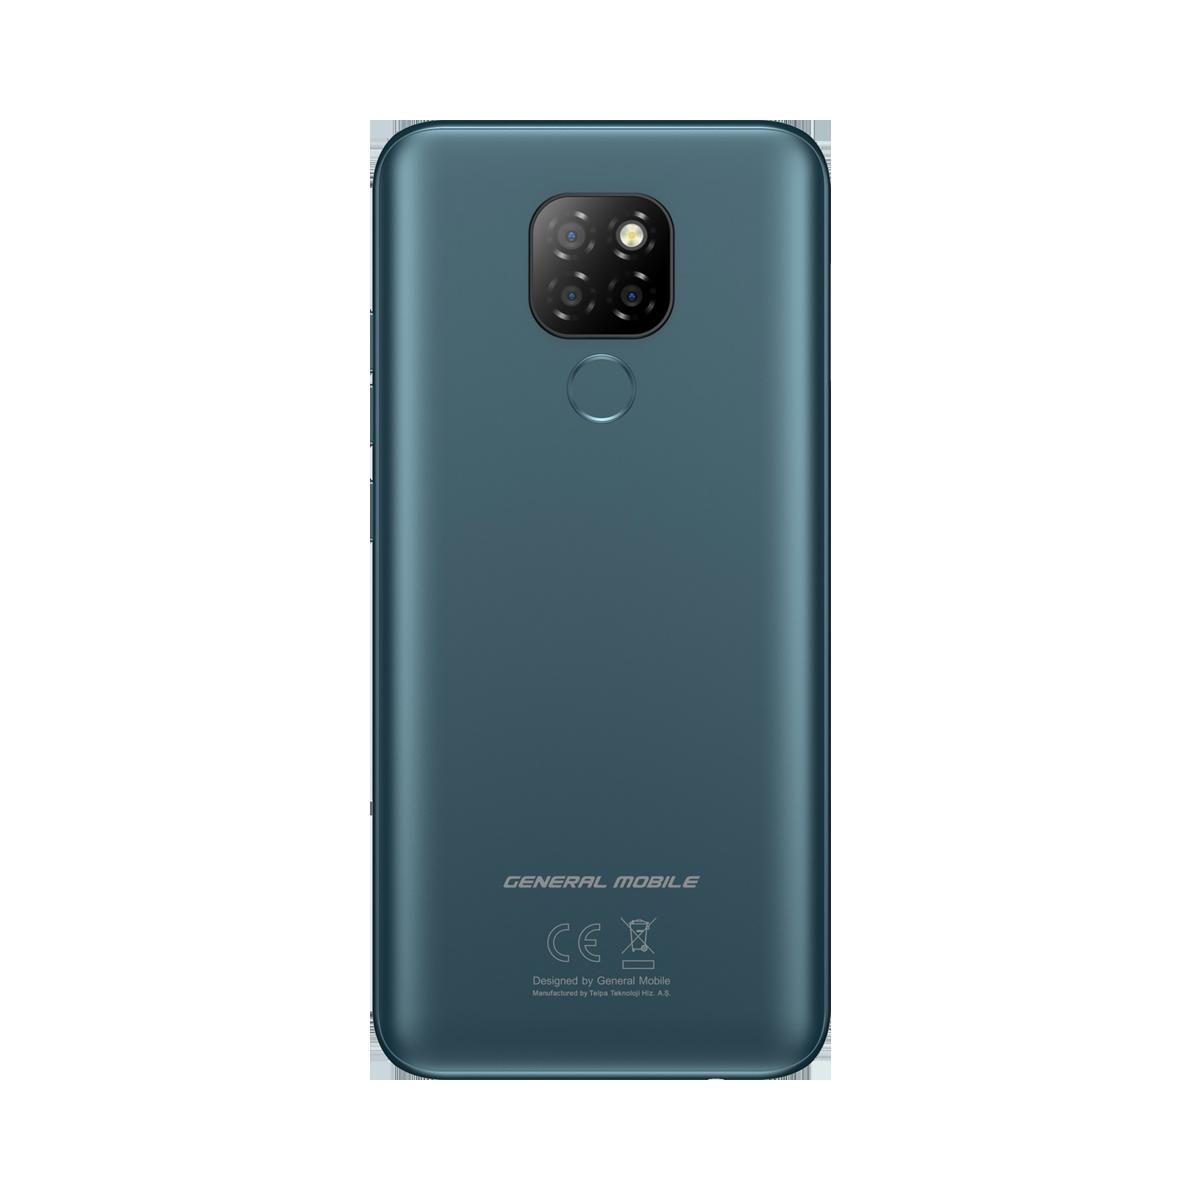 General Mobile GM 20 64 GB Yeşil